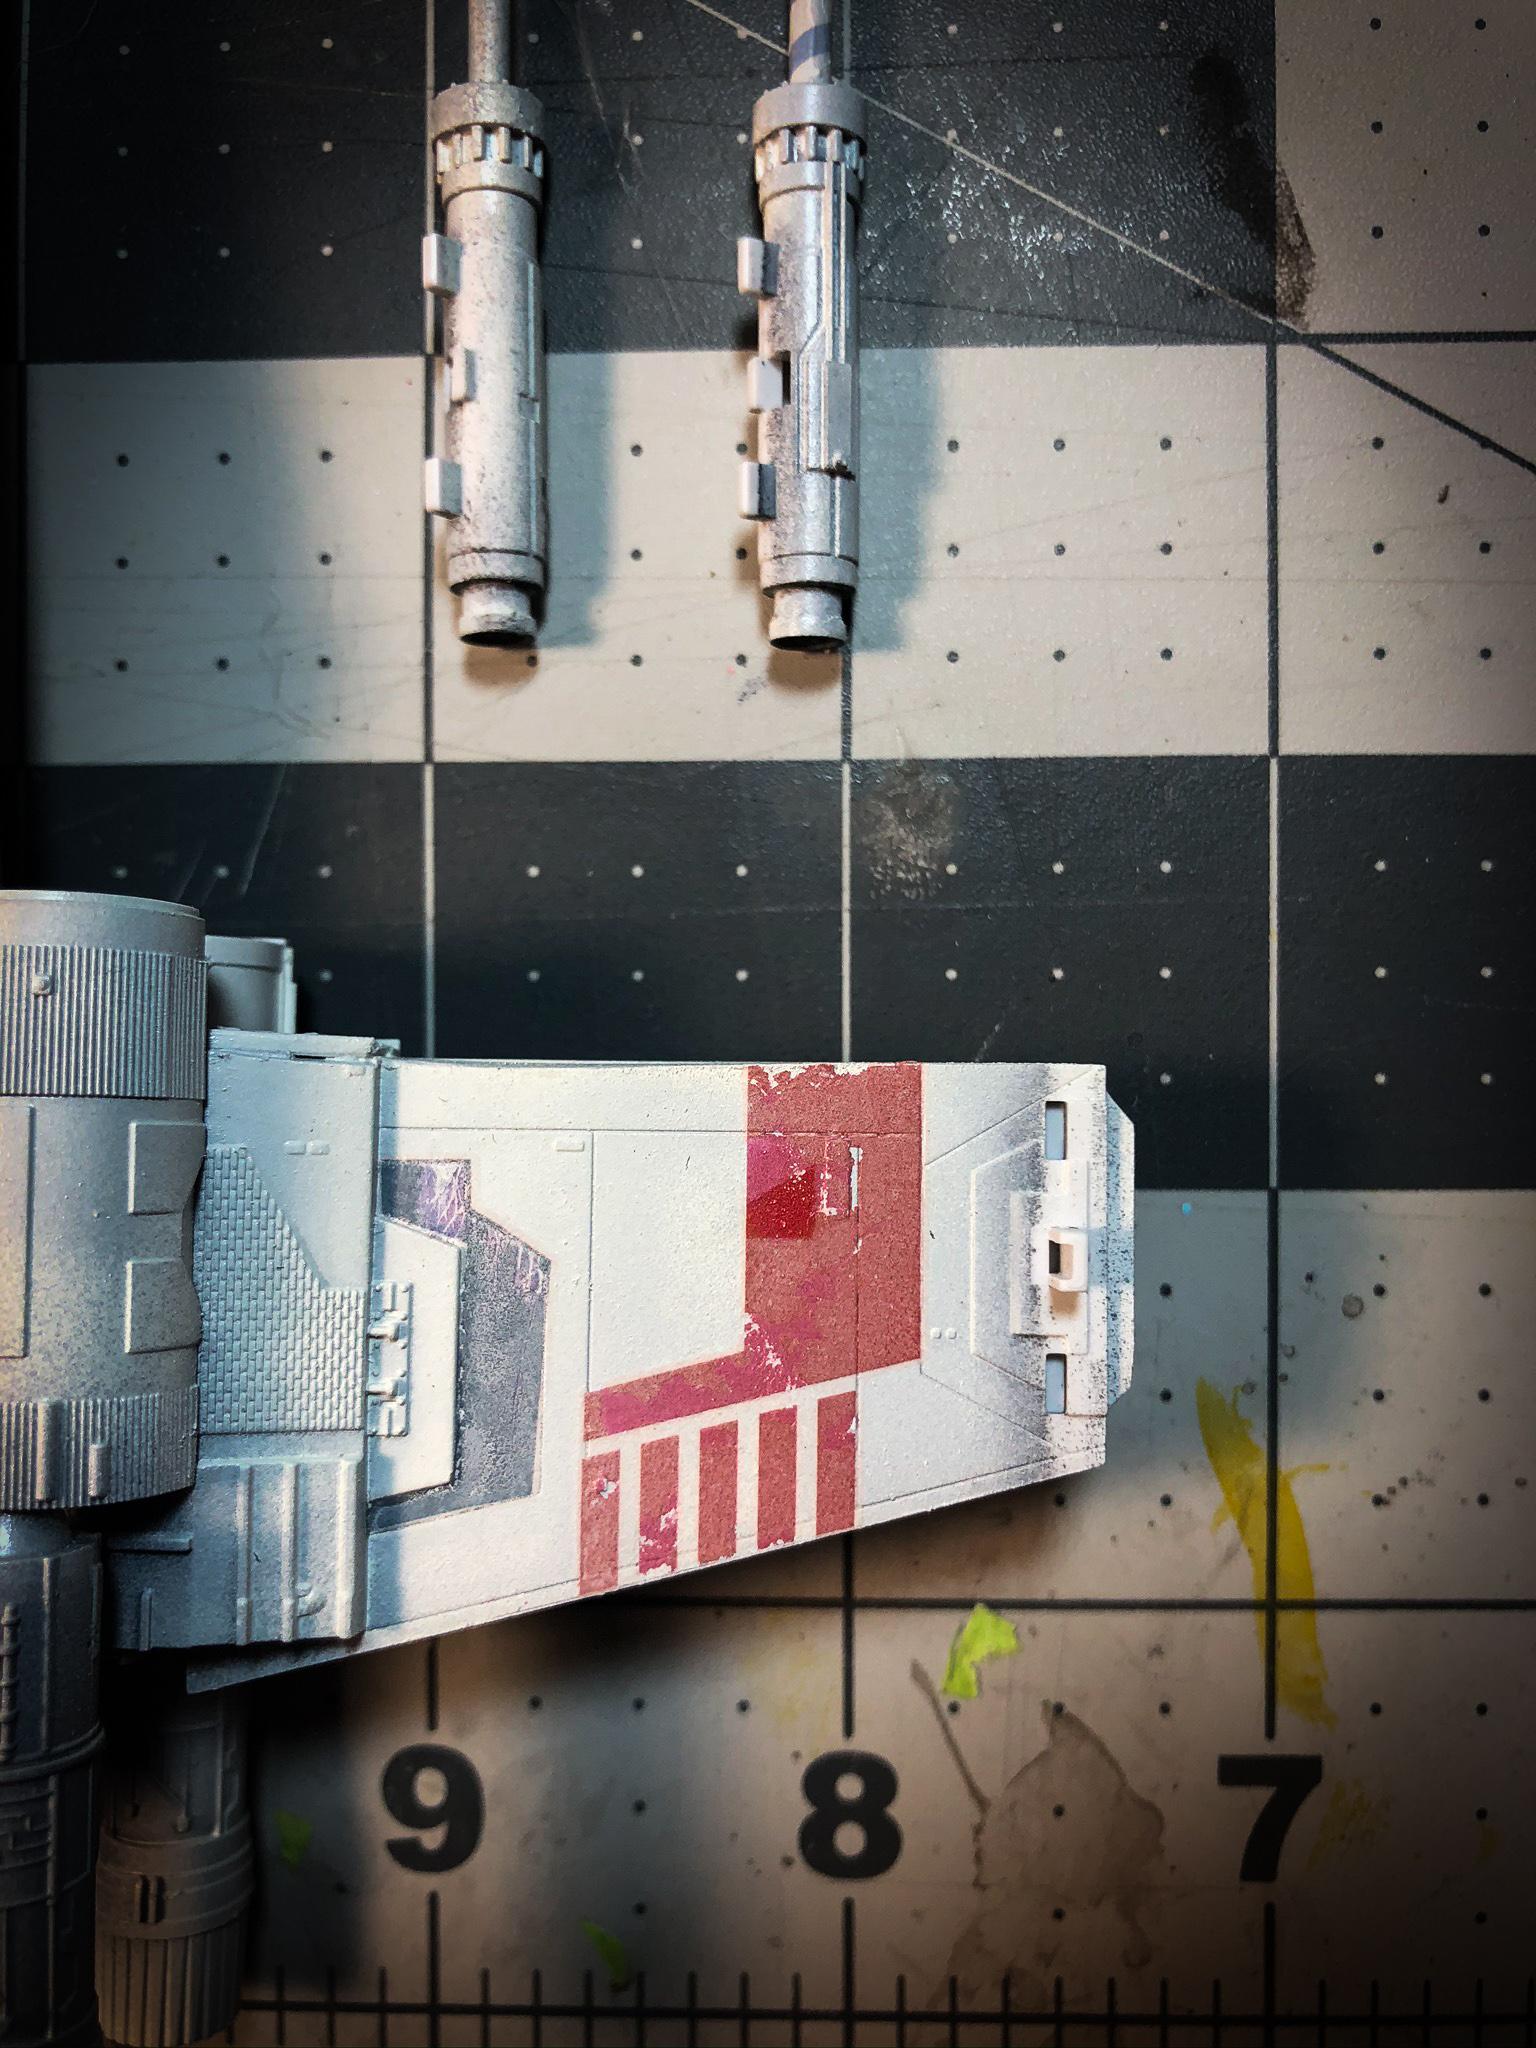 x-wing-15.jpg